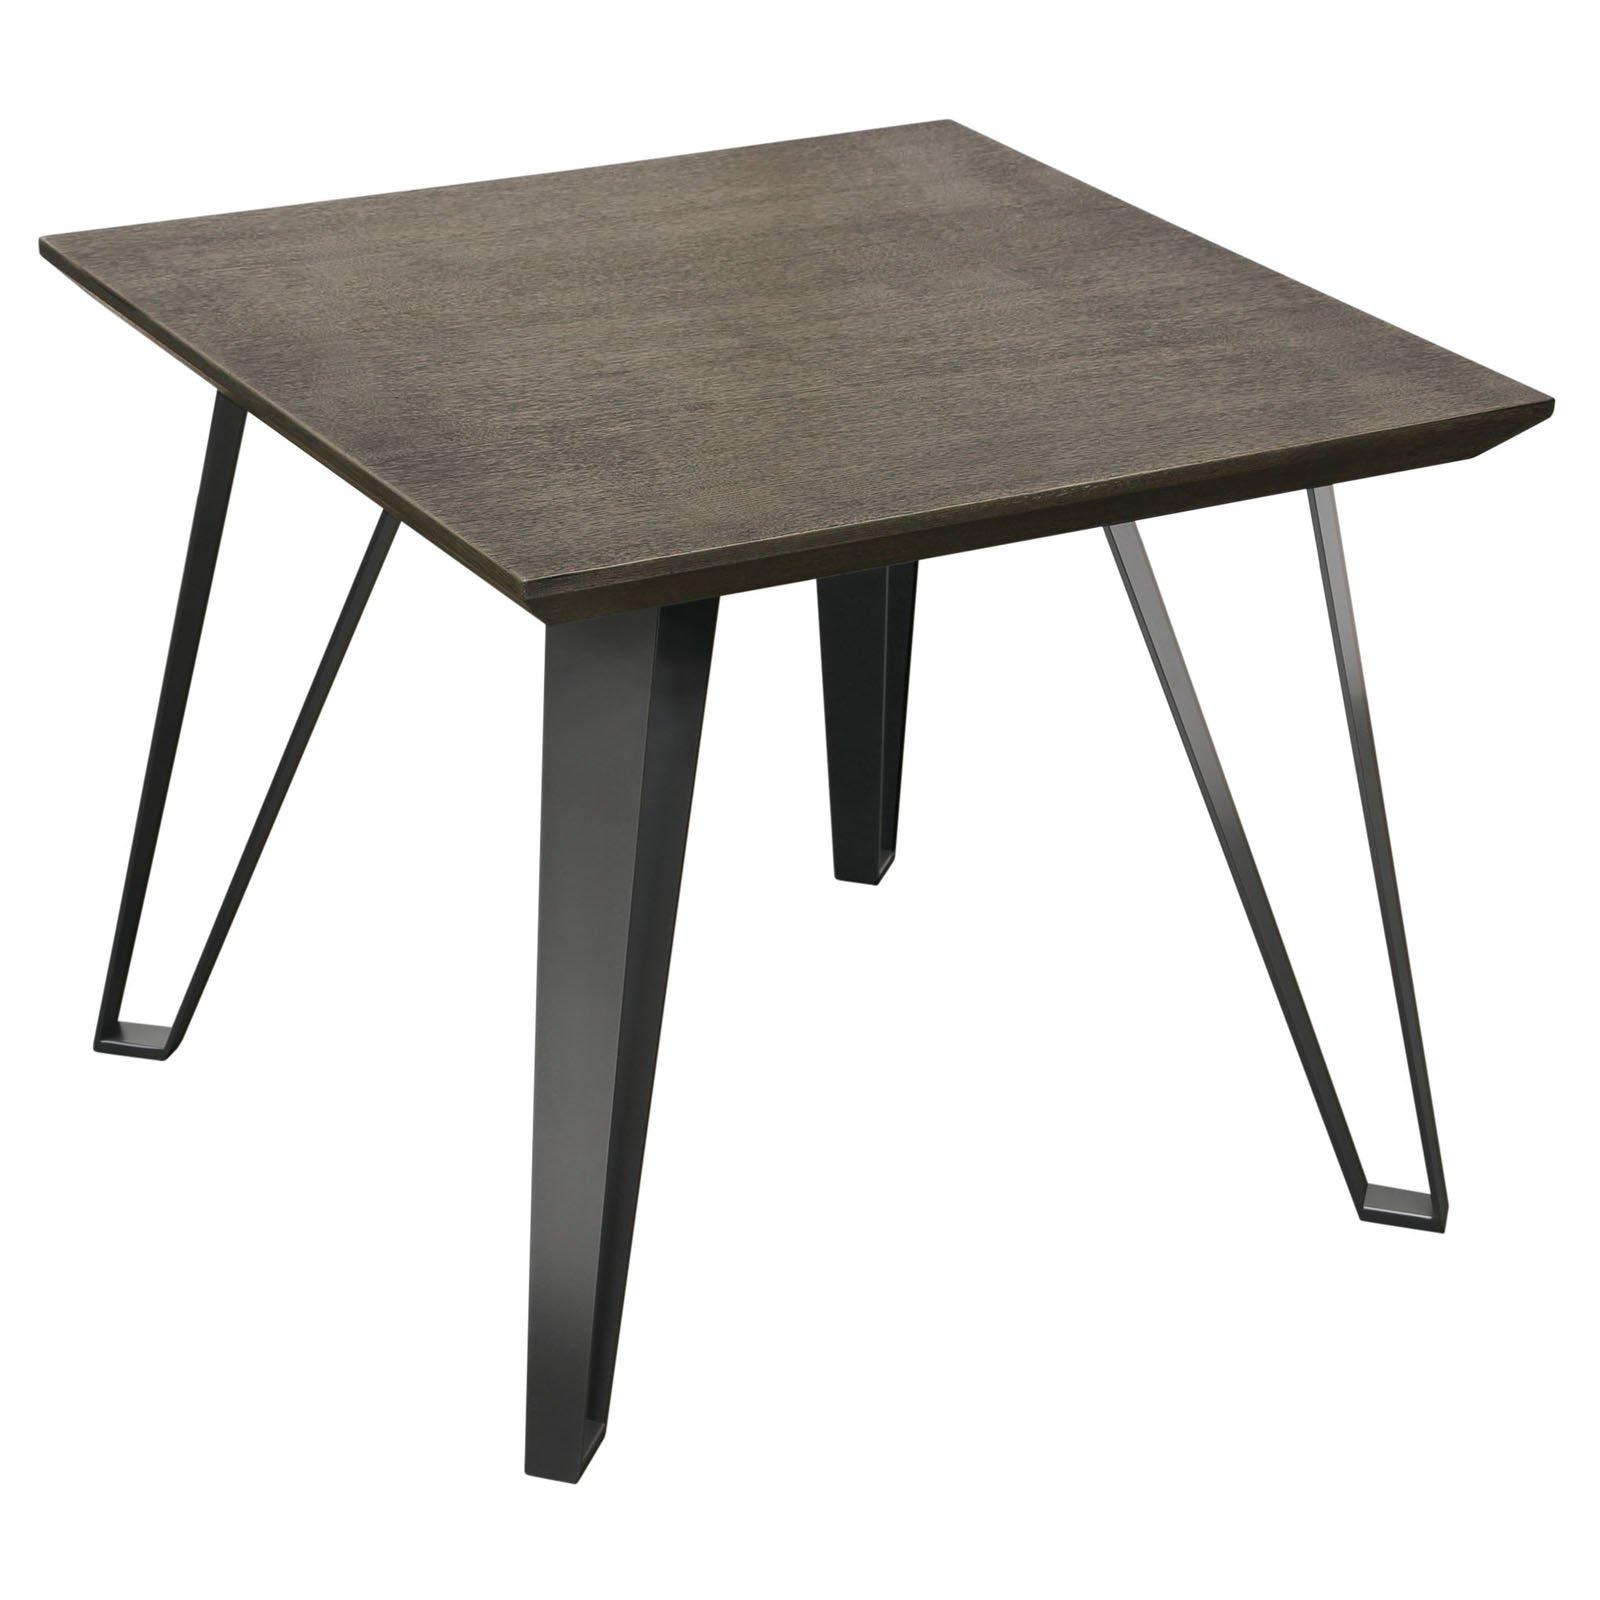 Diamond Sofa Sigma Square End Table - Chestnut